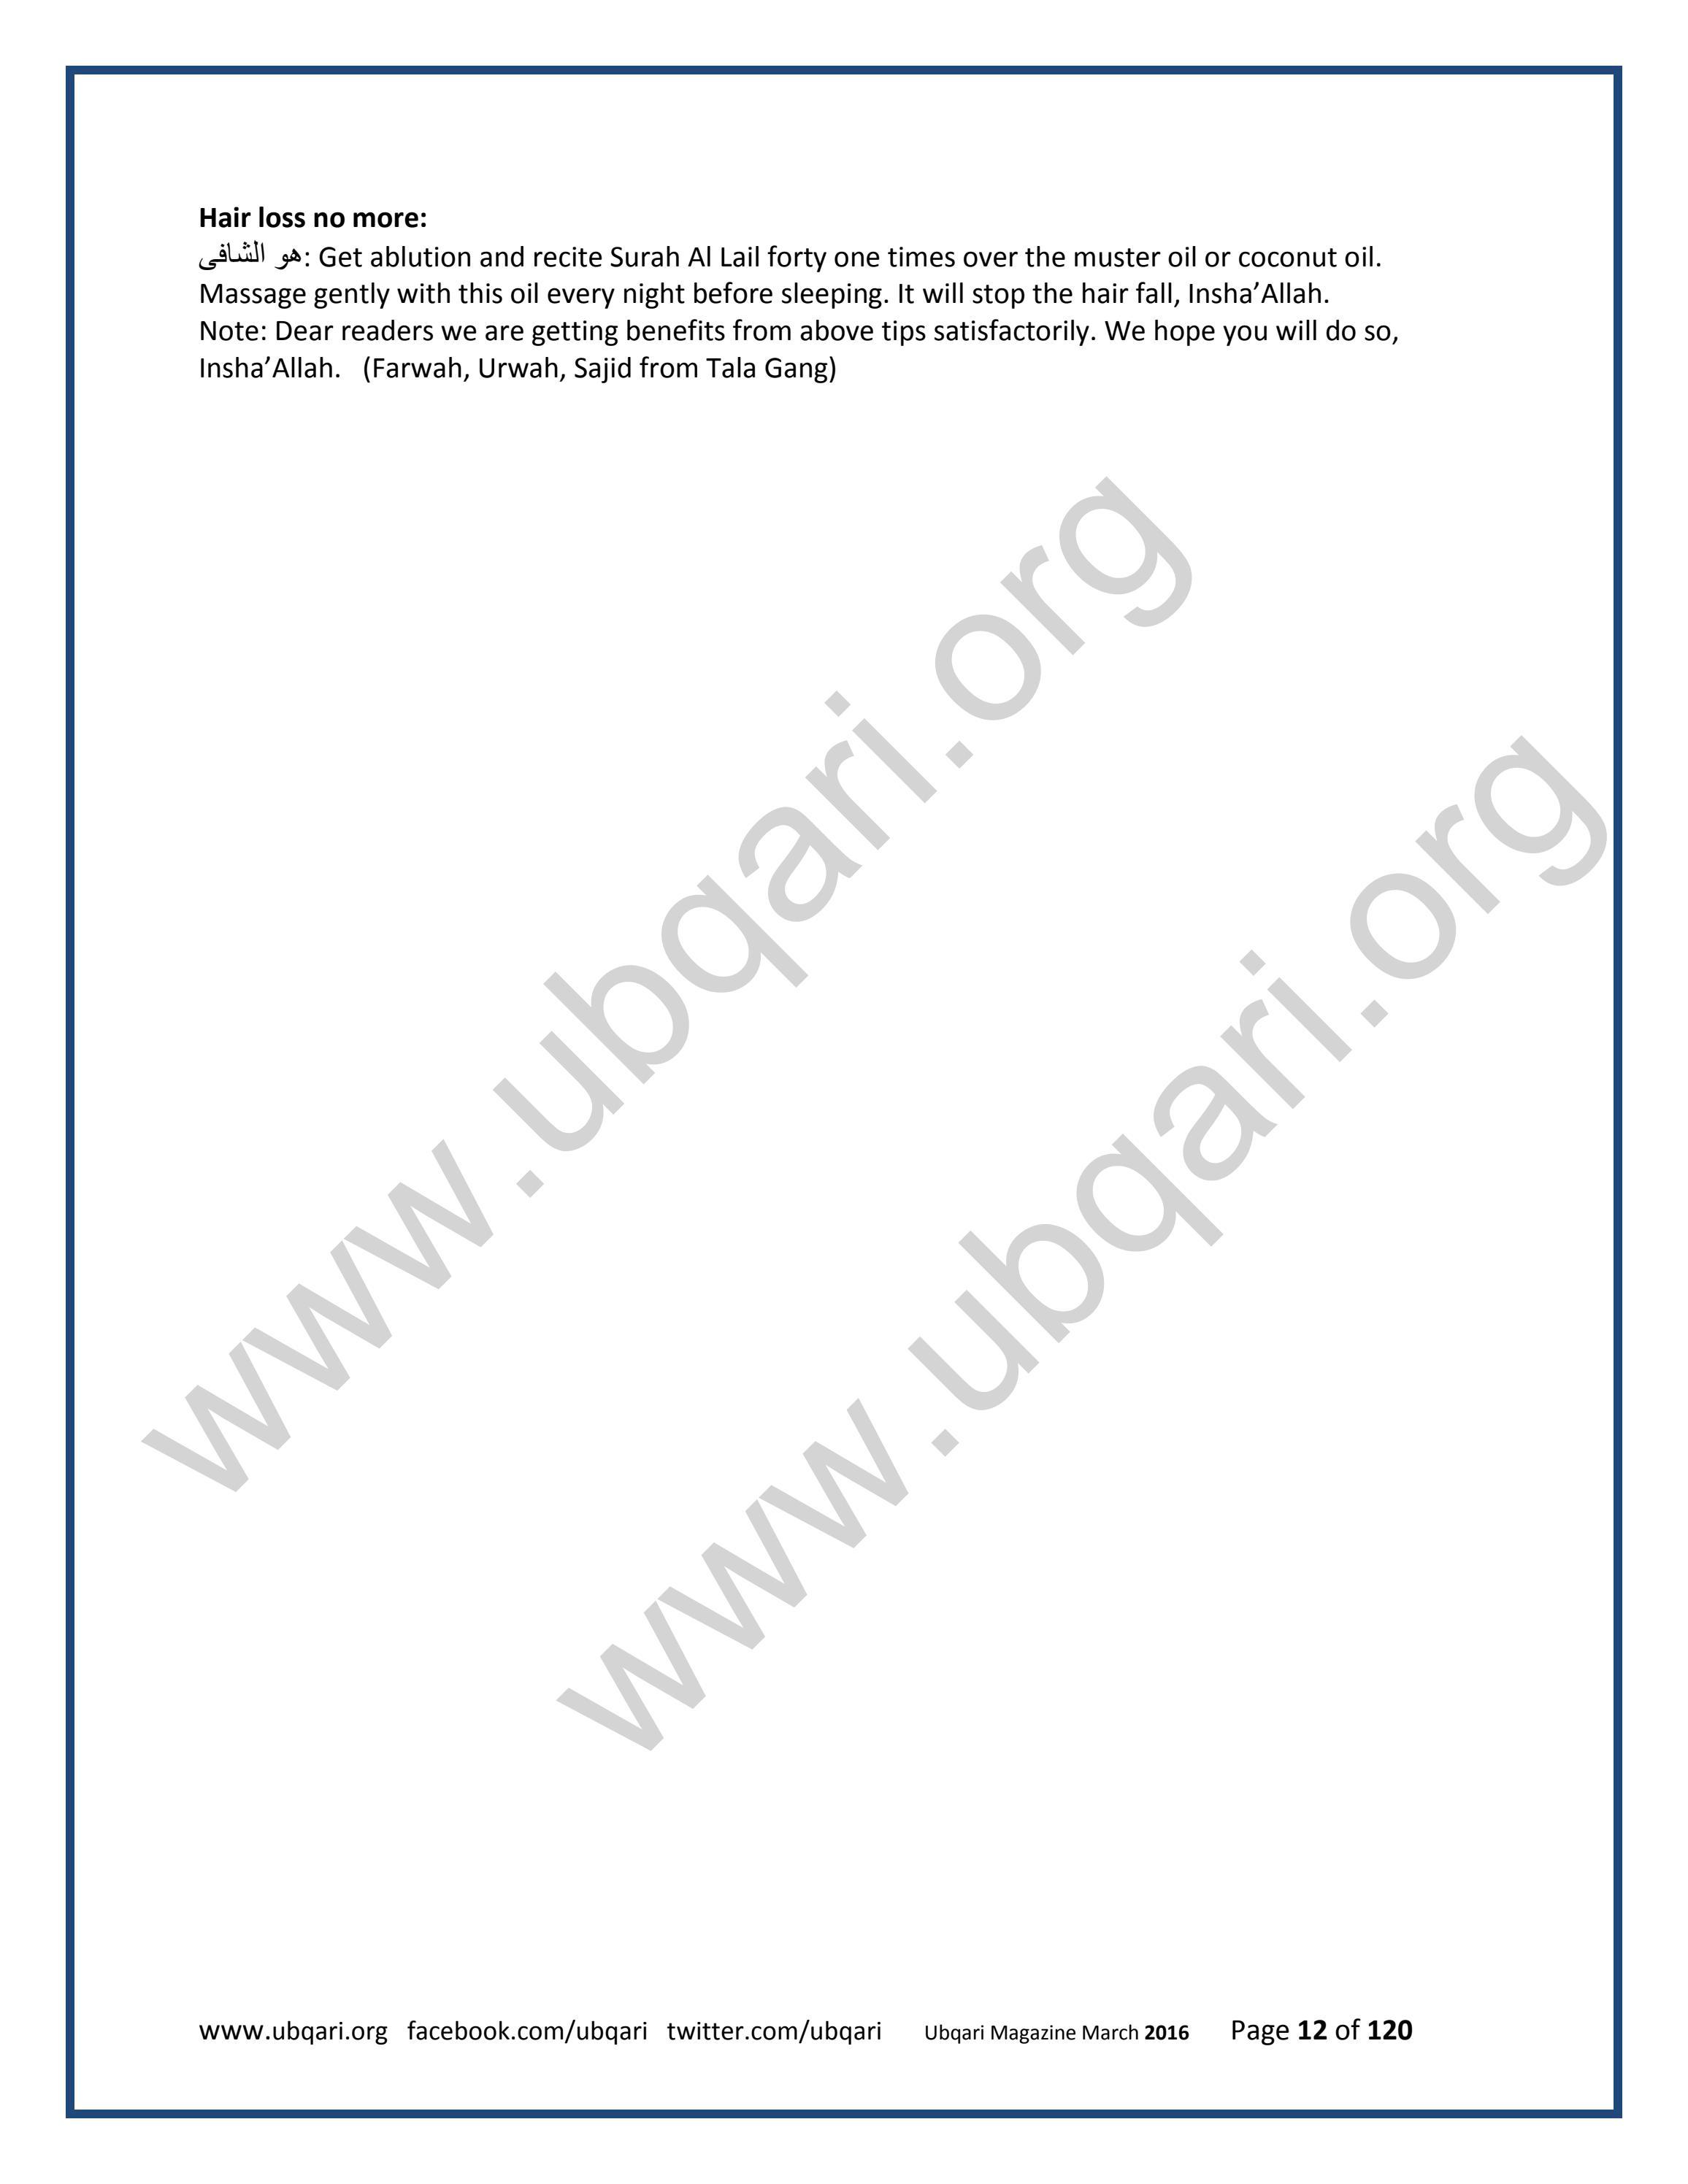 Monthly Ubqari Magazine March 2016 in English by Ubqari - issuu